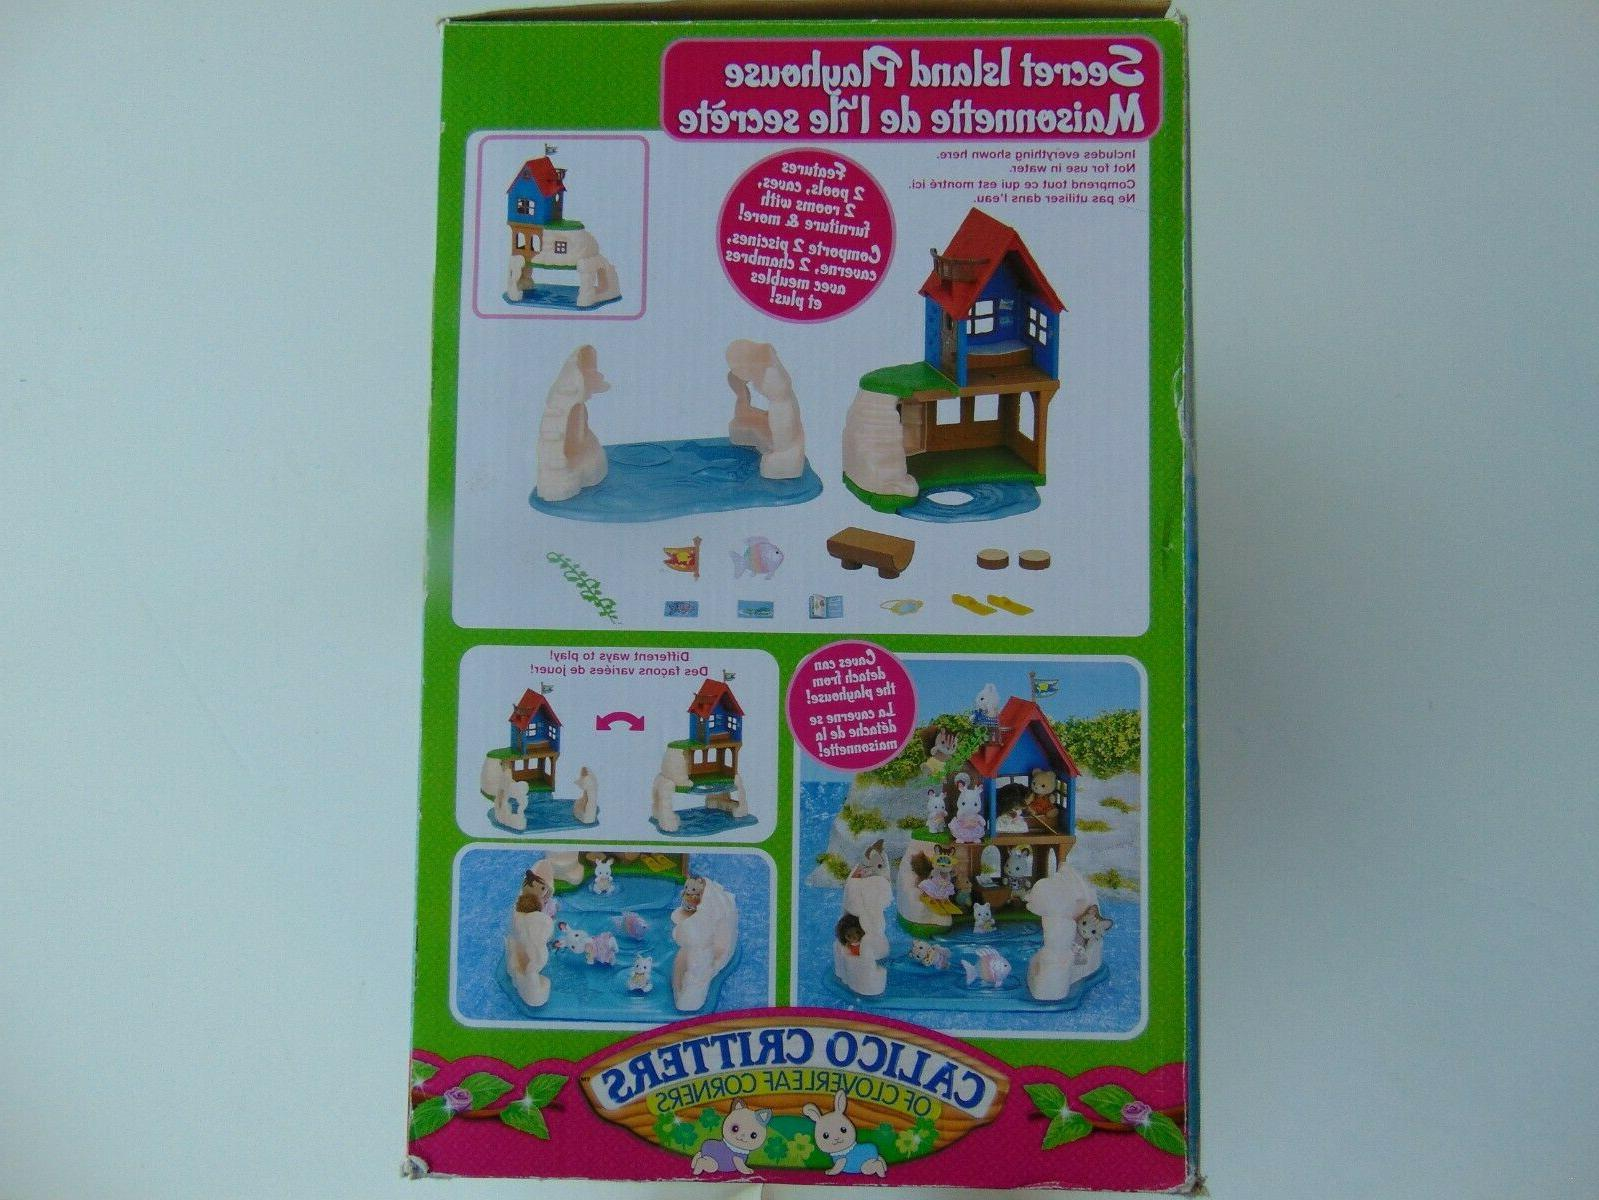 secret island playhouse brand new factory sealed